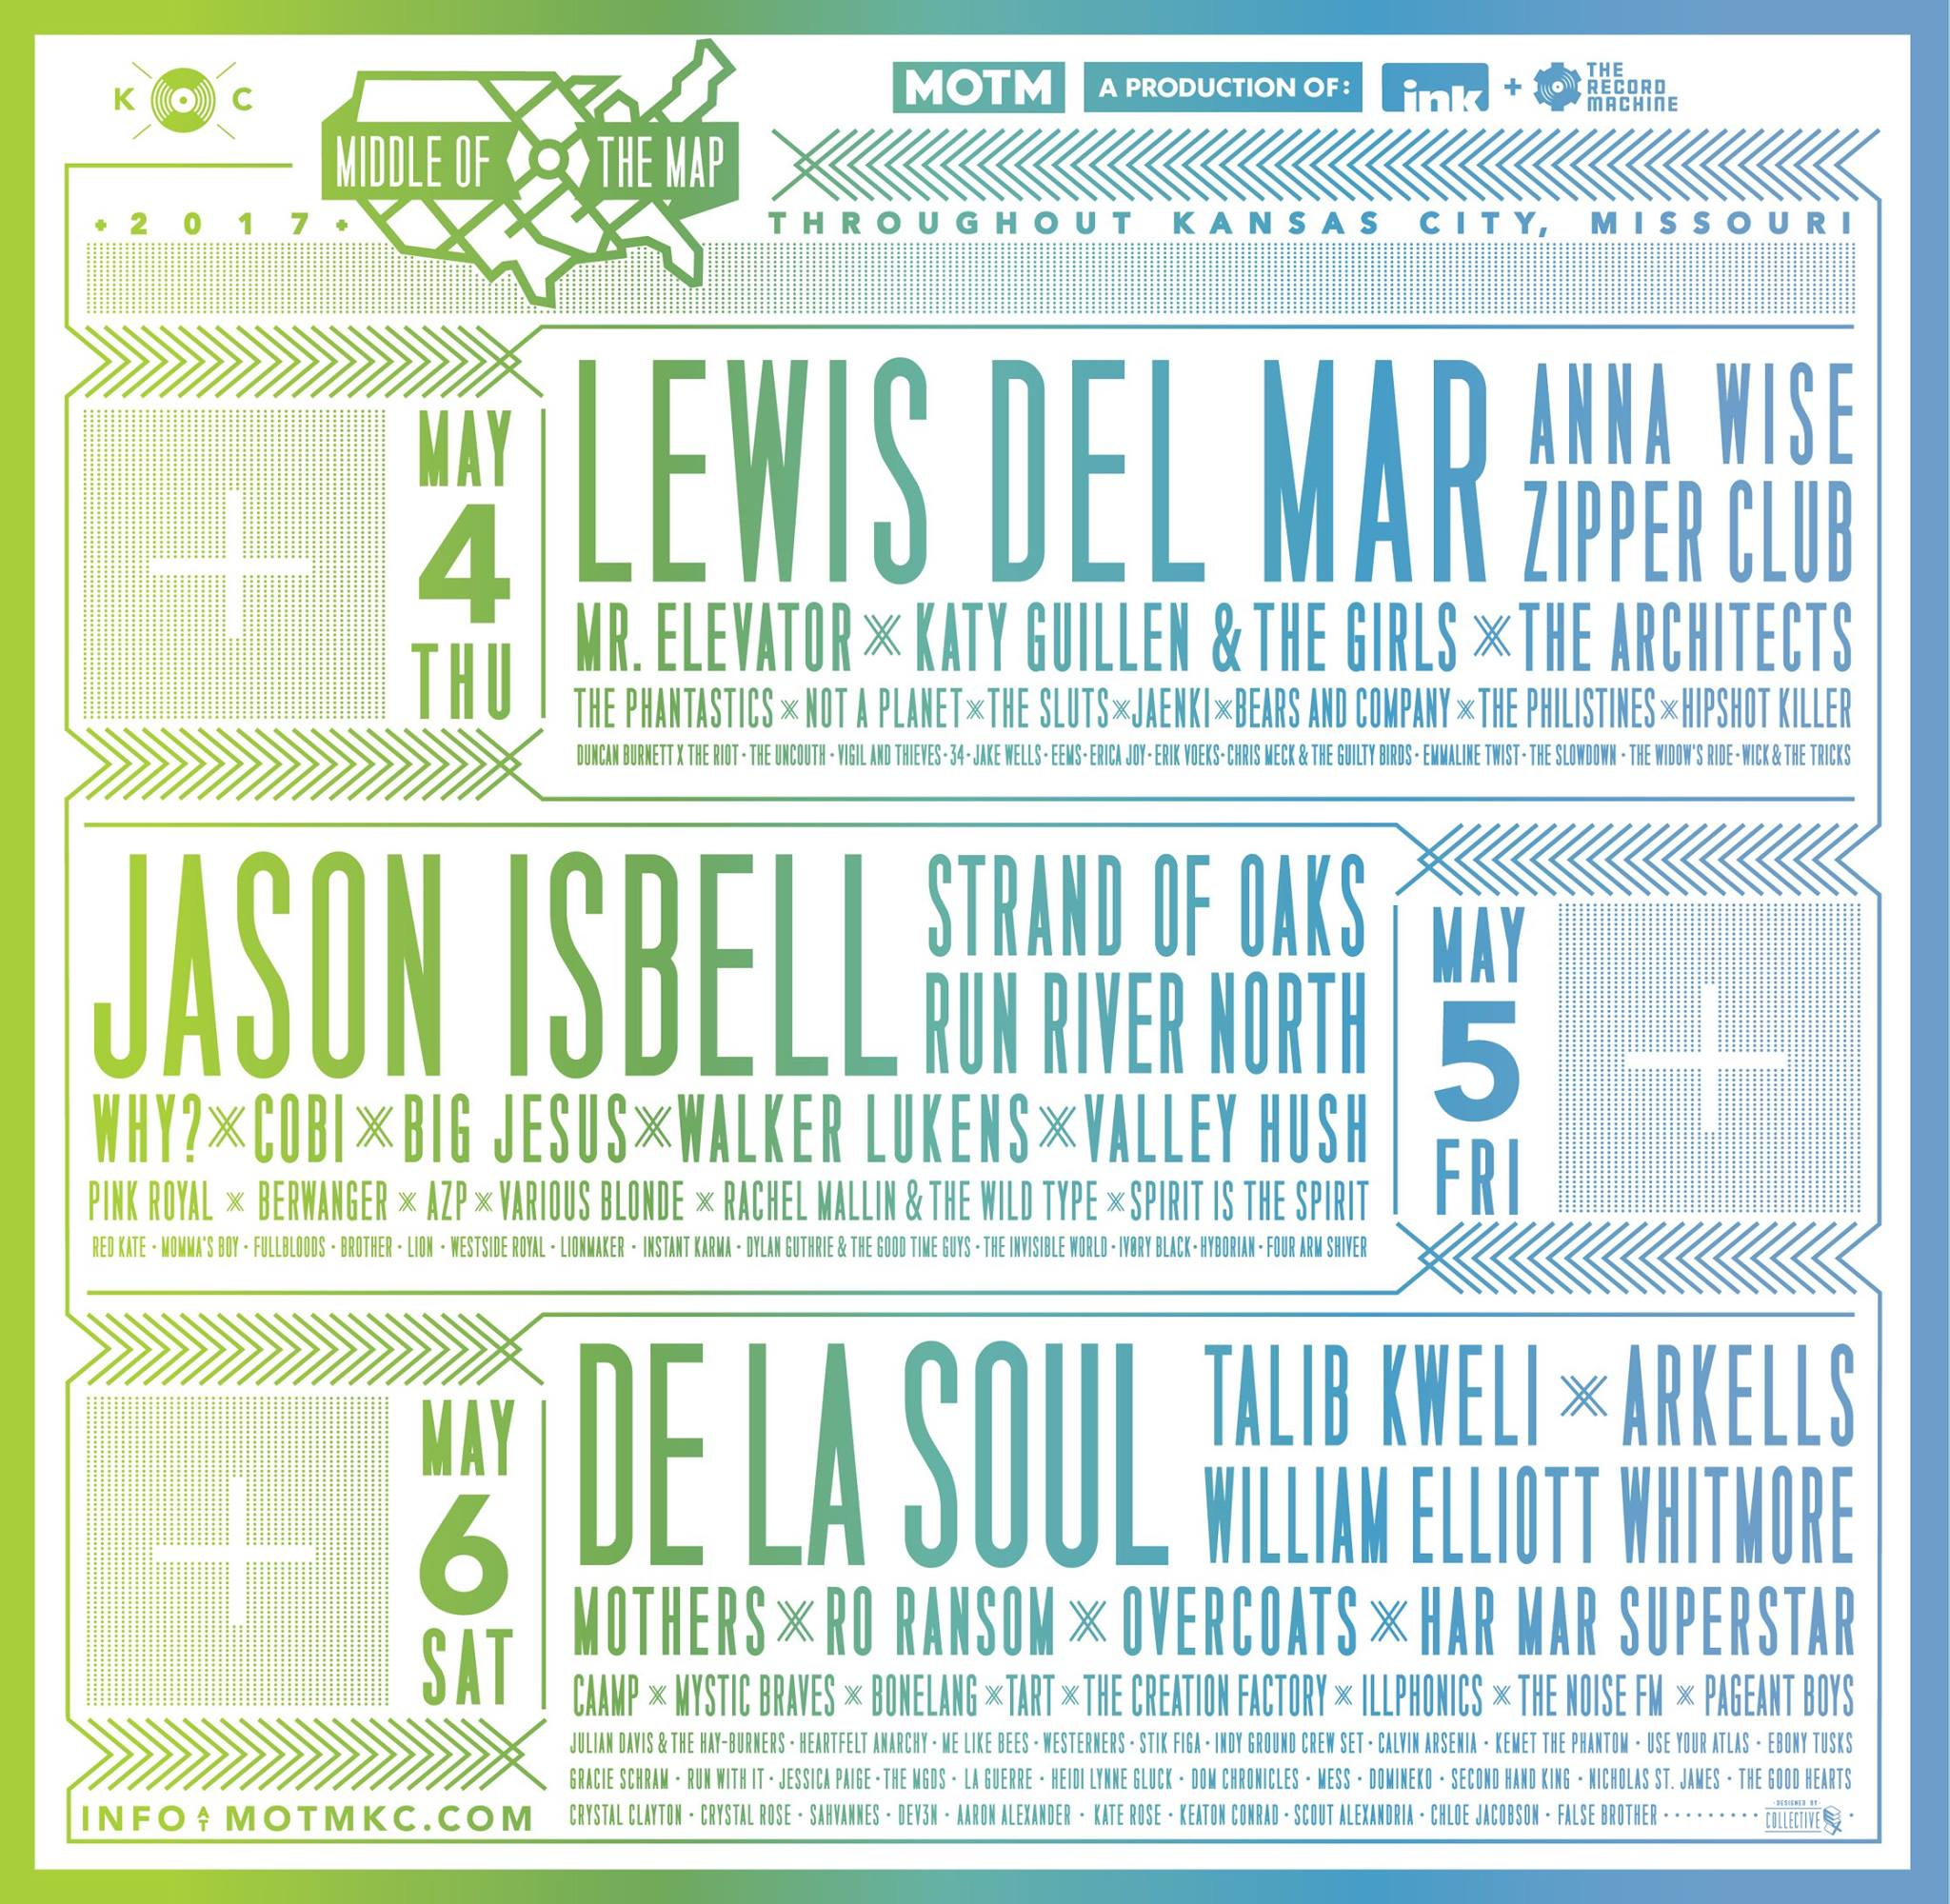 Middle of the Map Fest 2017 lineup announced, featuring De La Soul, Jason Isbell & Lewis Del Mar